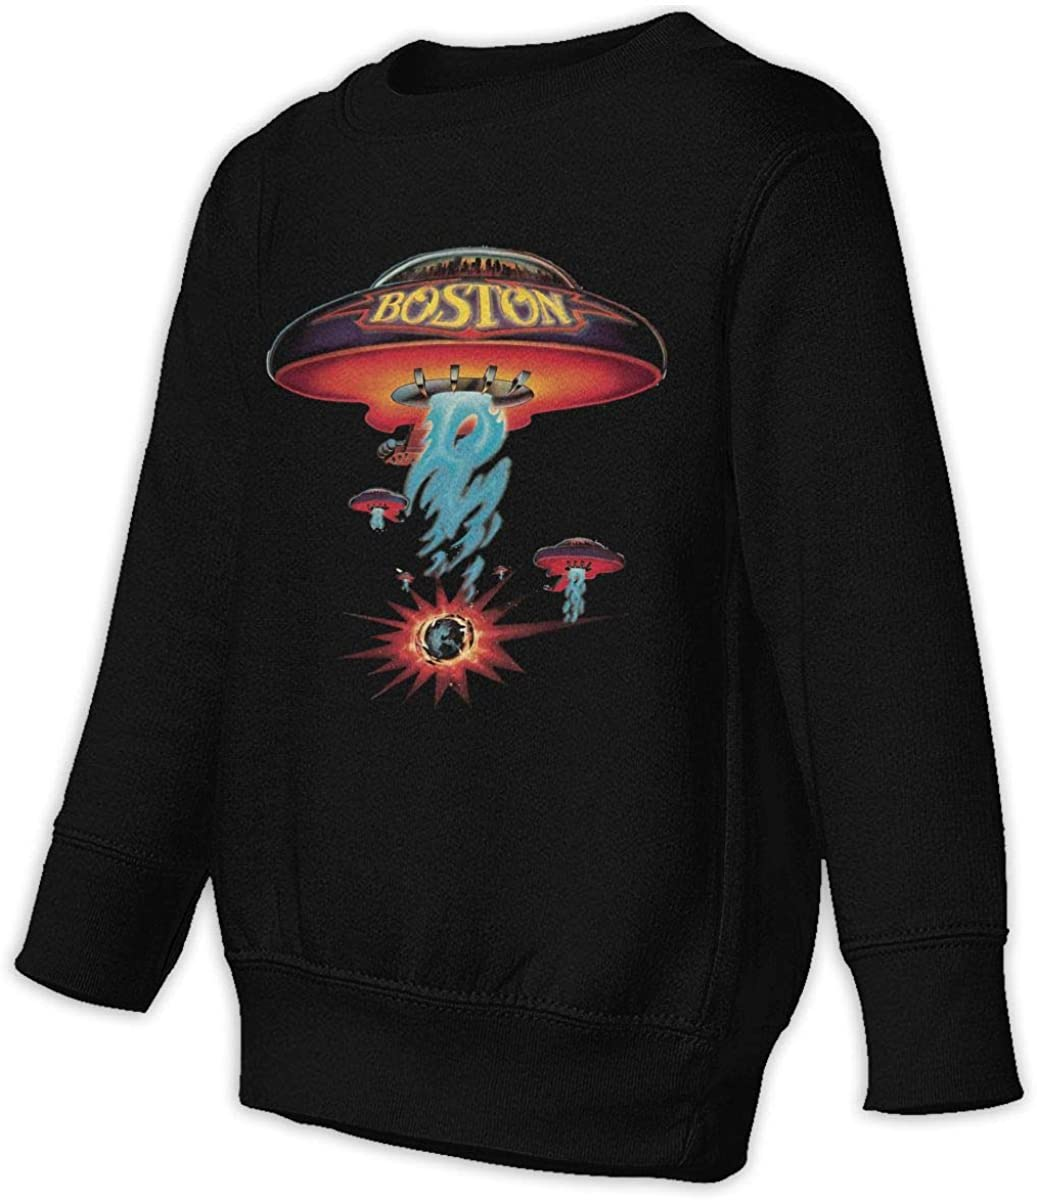 NOT Boston Rock Band Unisex Sweatshirt Youth Boy and Girls Pullover Sweatshirt